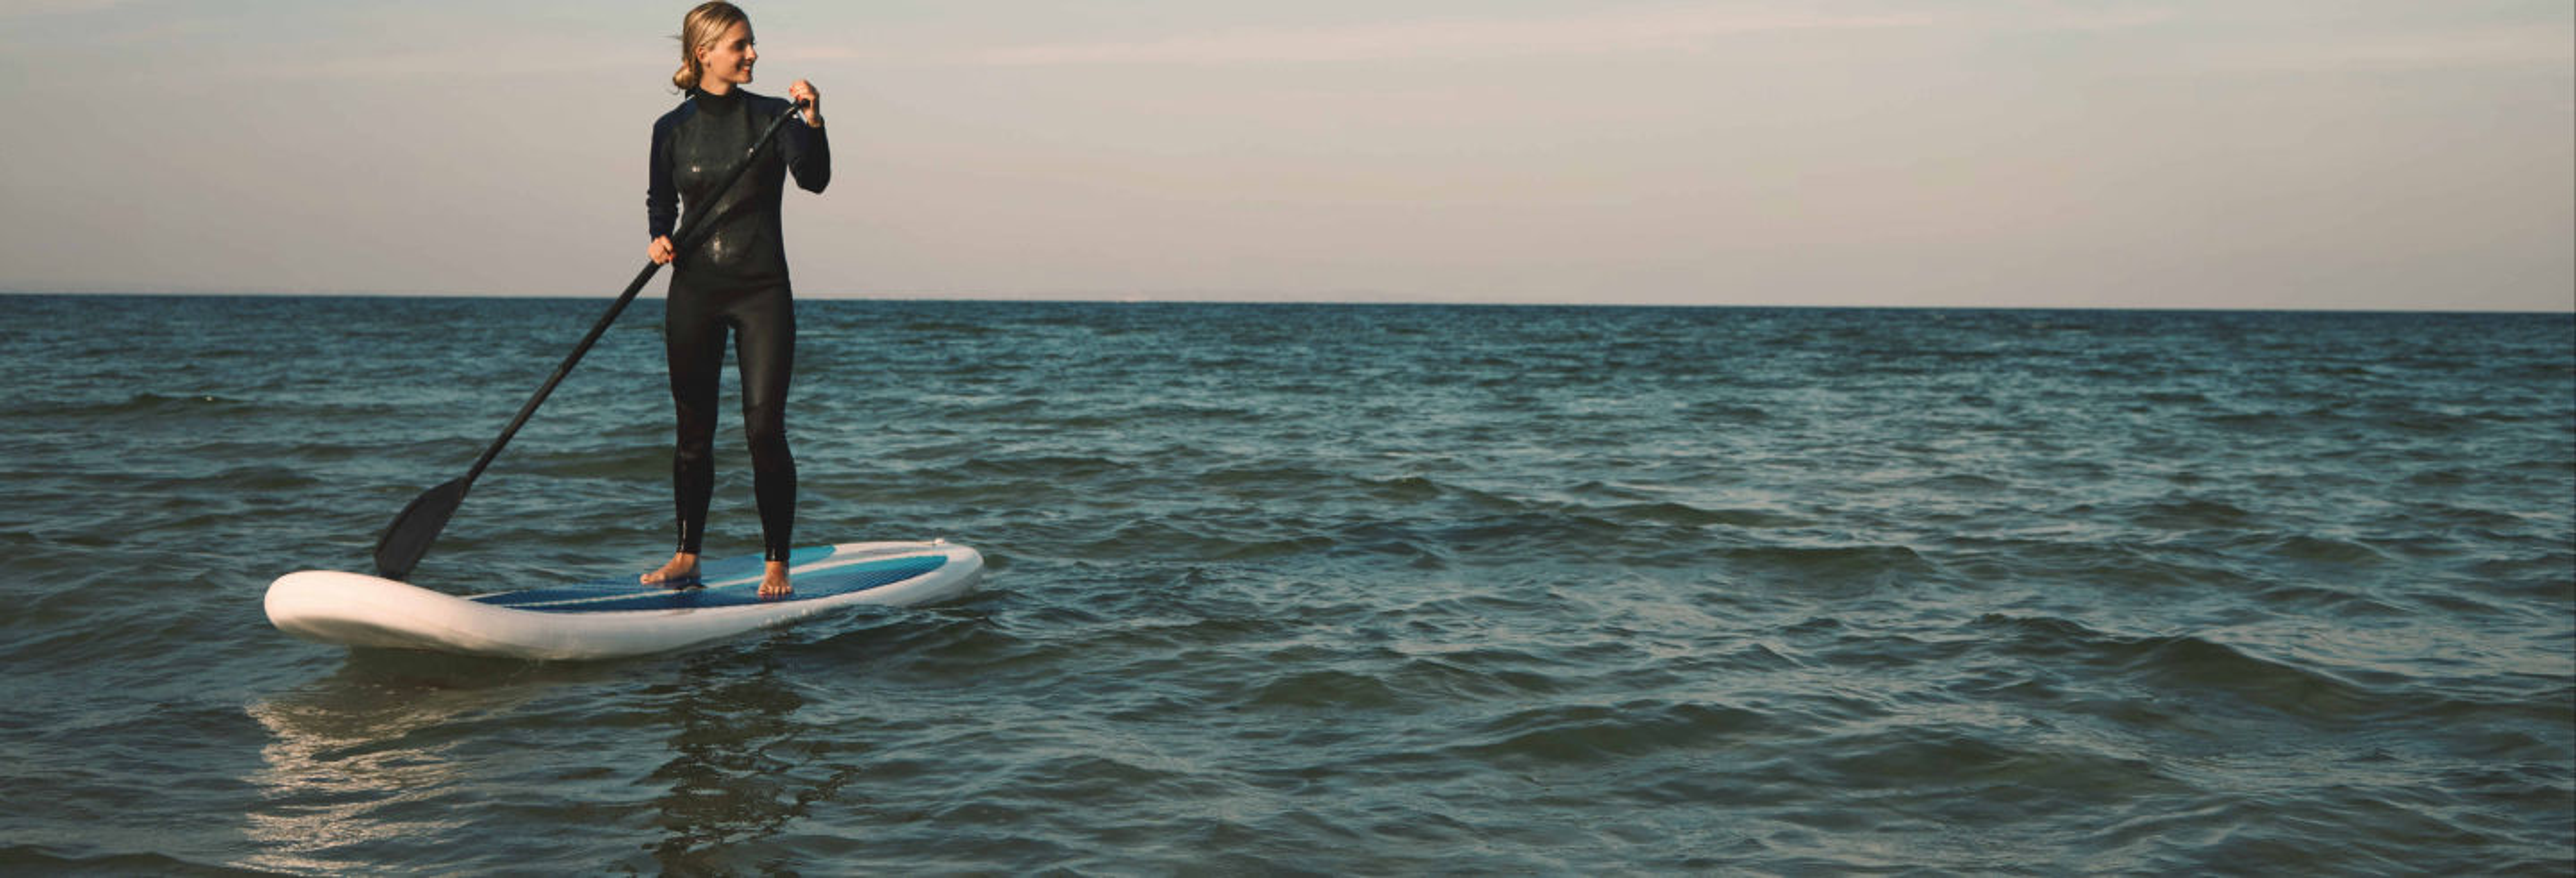 Paddle surf en Mundaka